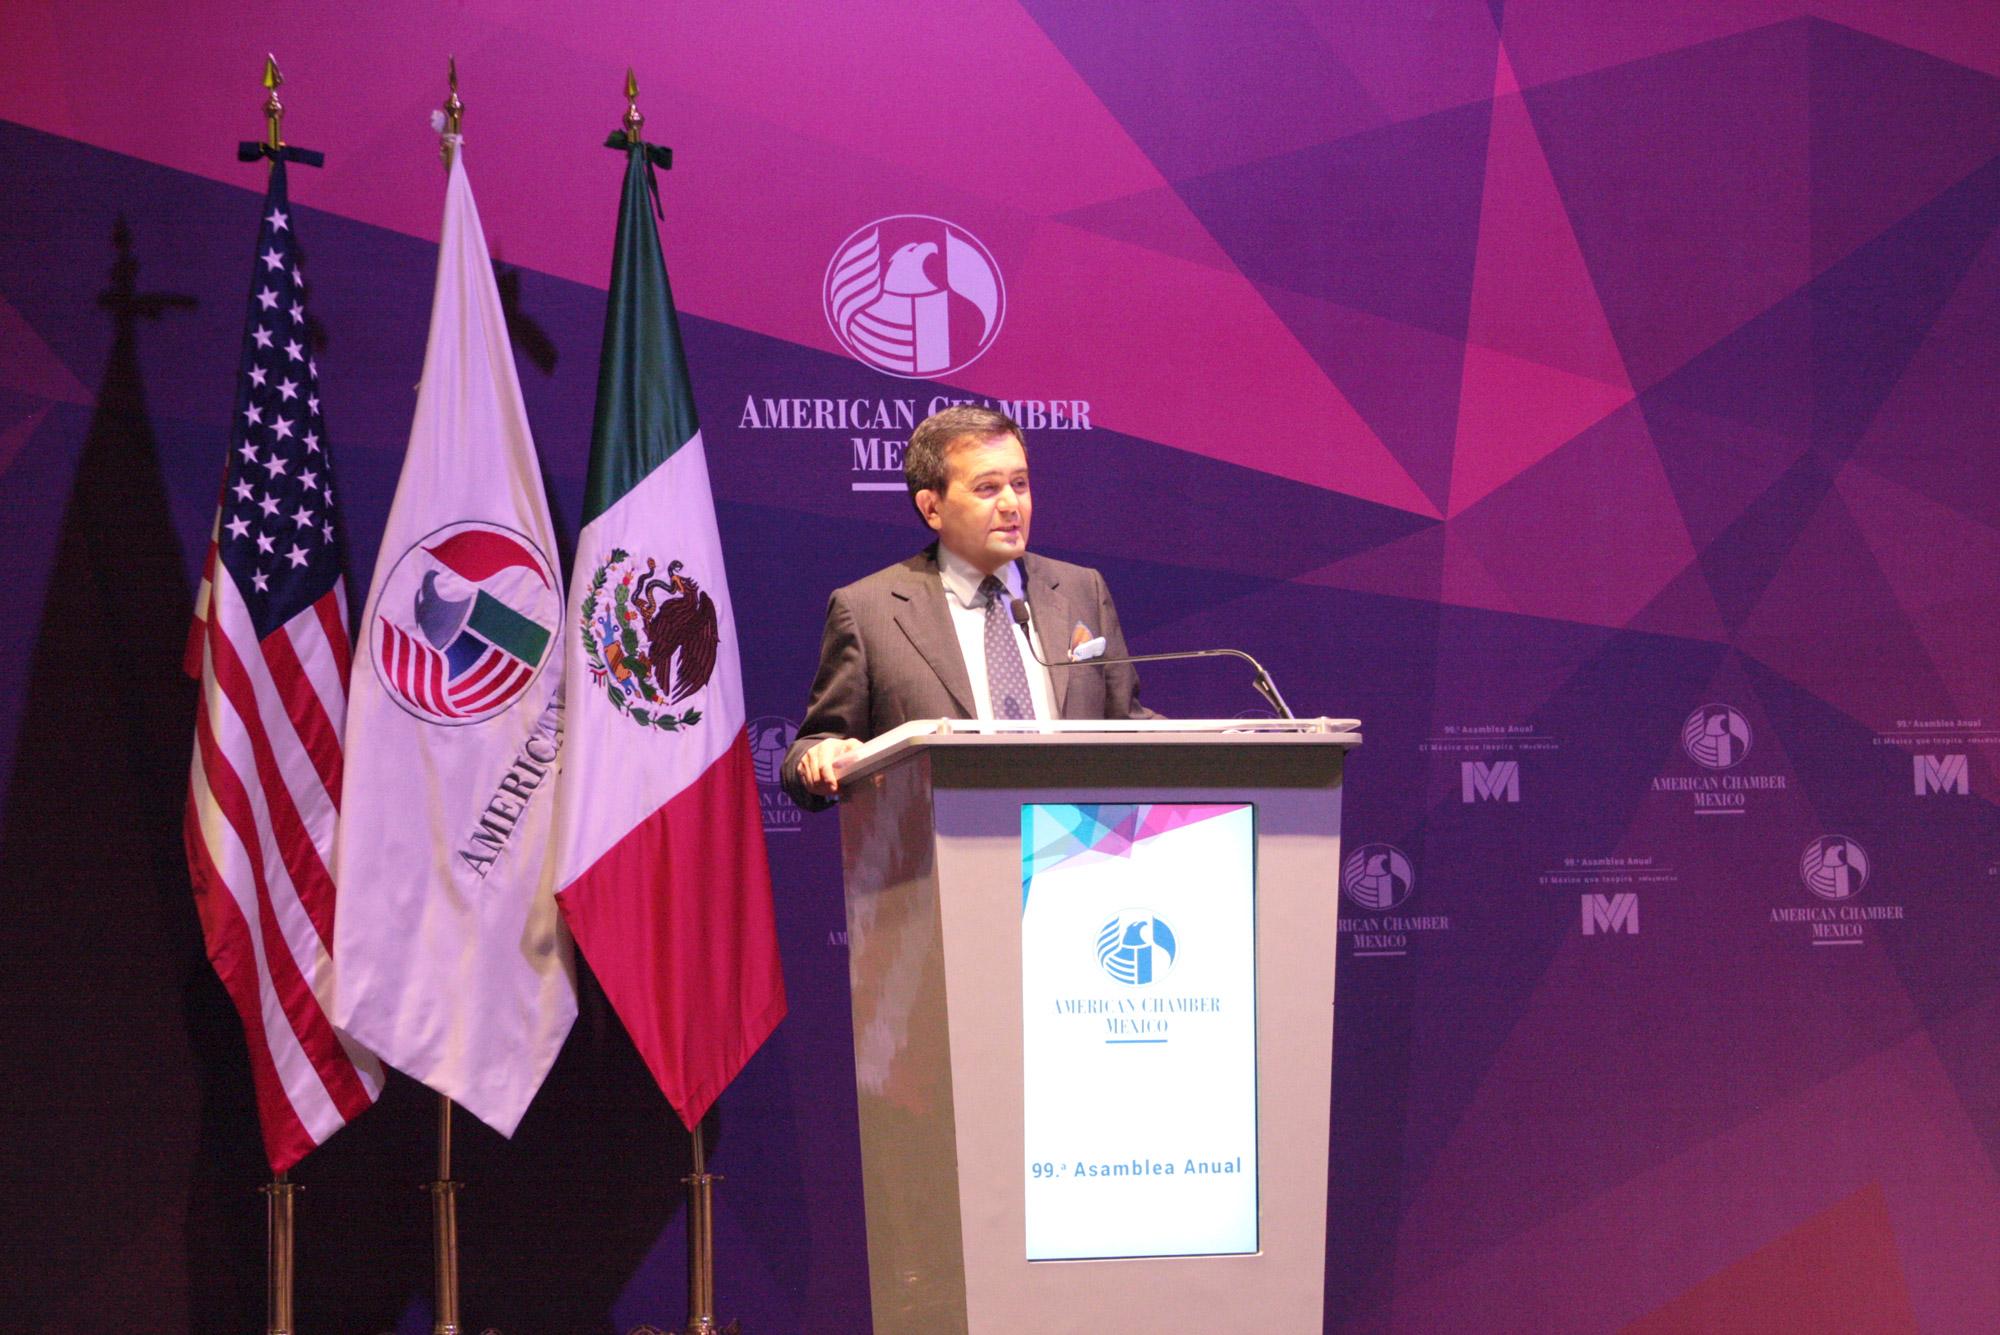 El Secretario de Economía asistió a la 99ª Asamblea Anual de la AMCHAM